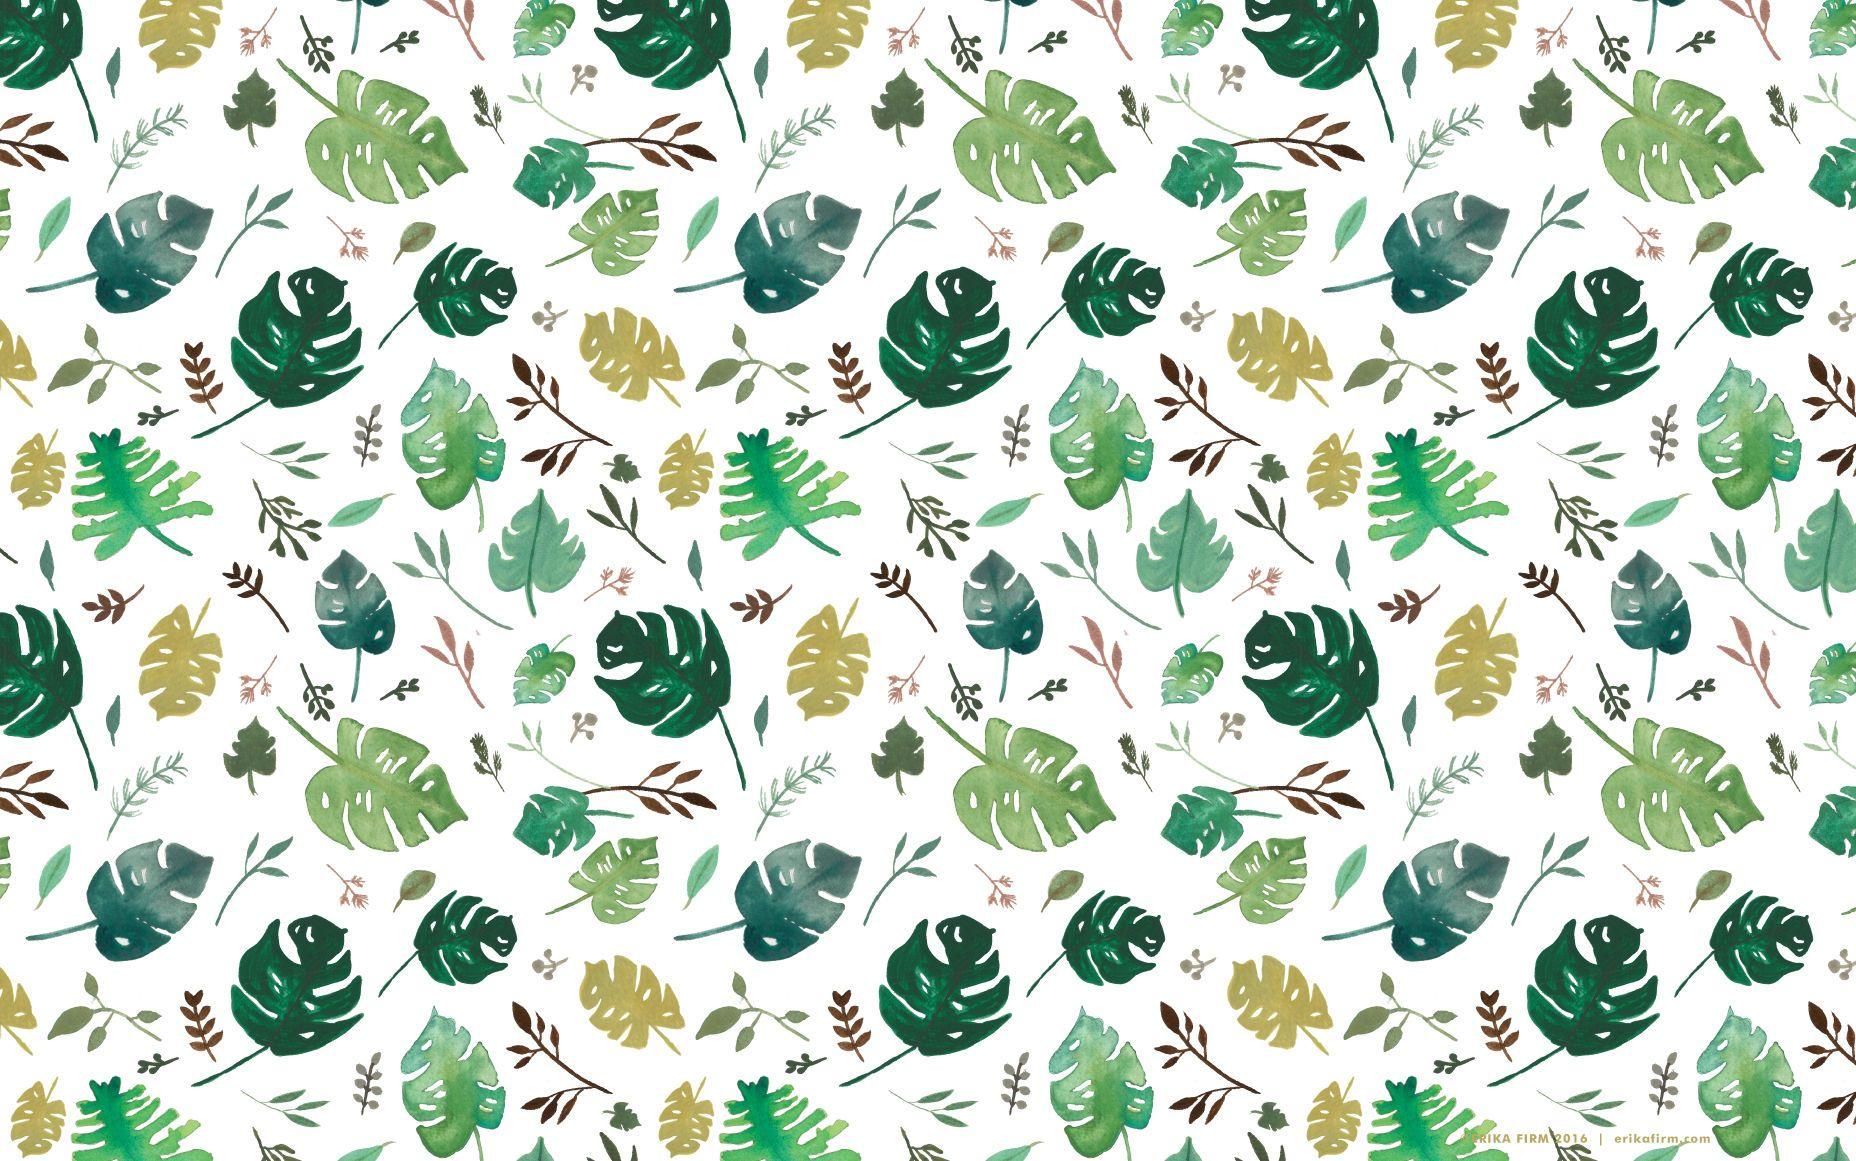 Wallpapers Tree desktop wallpaper, Tree print wallpaper